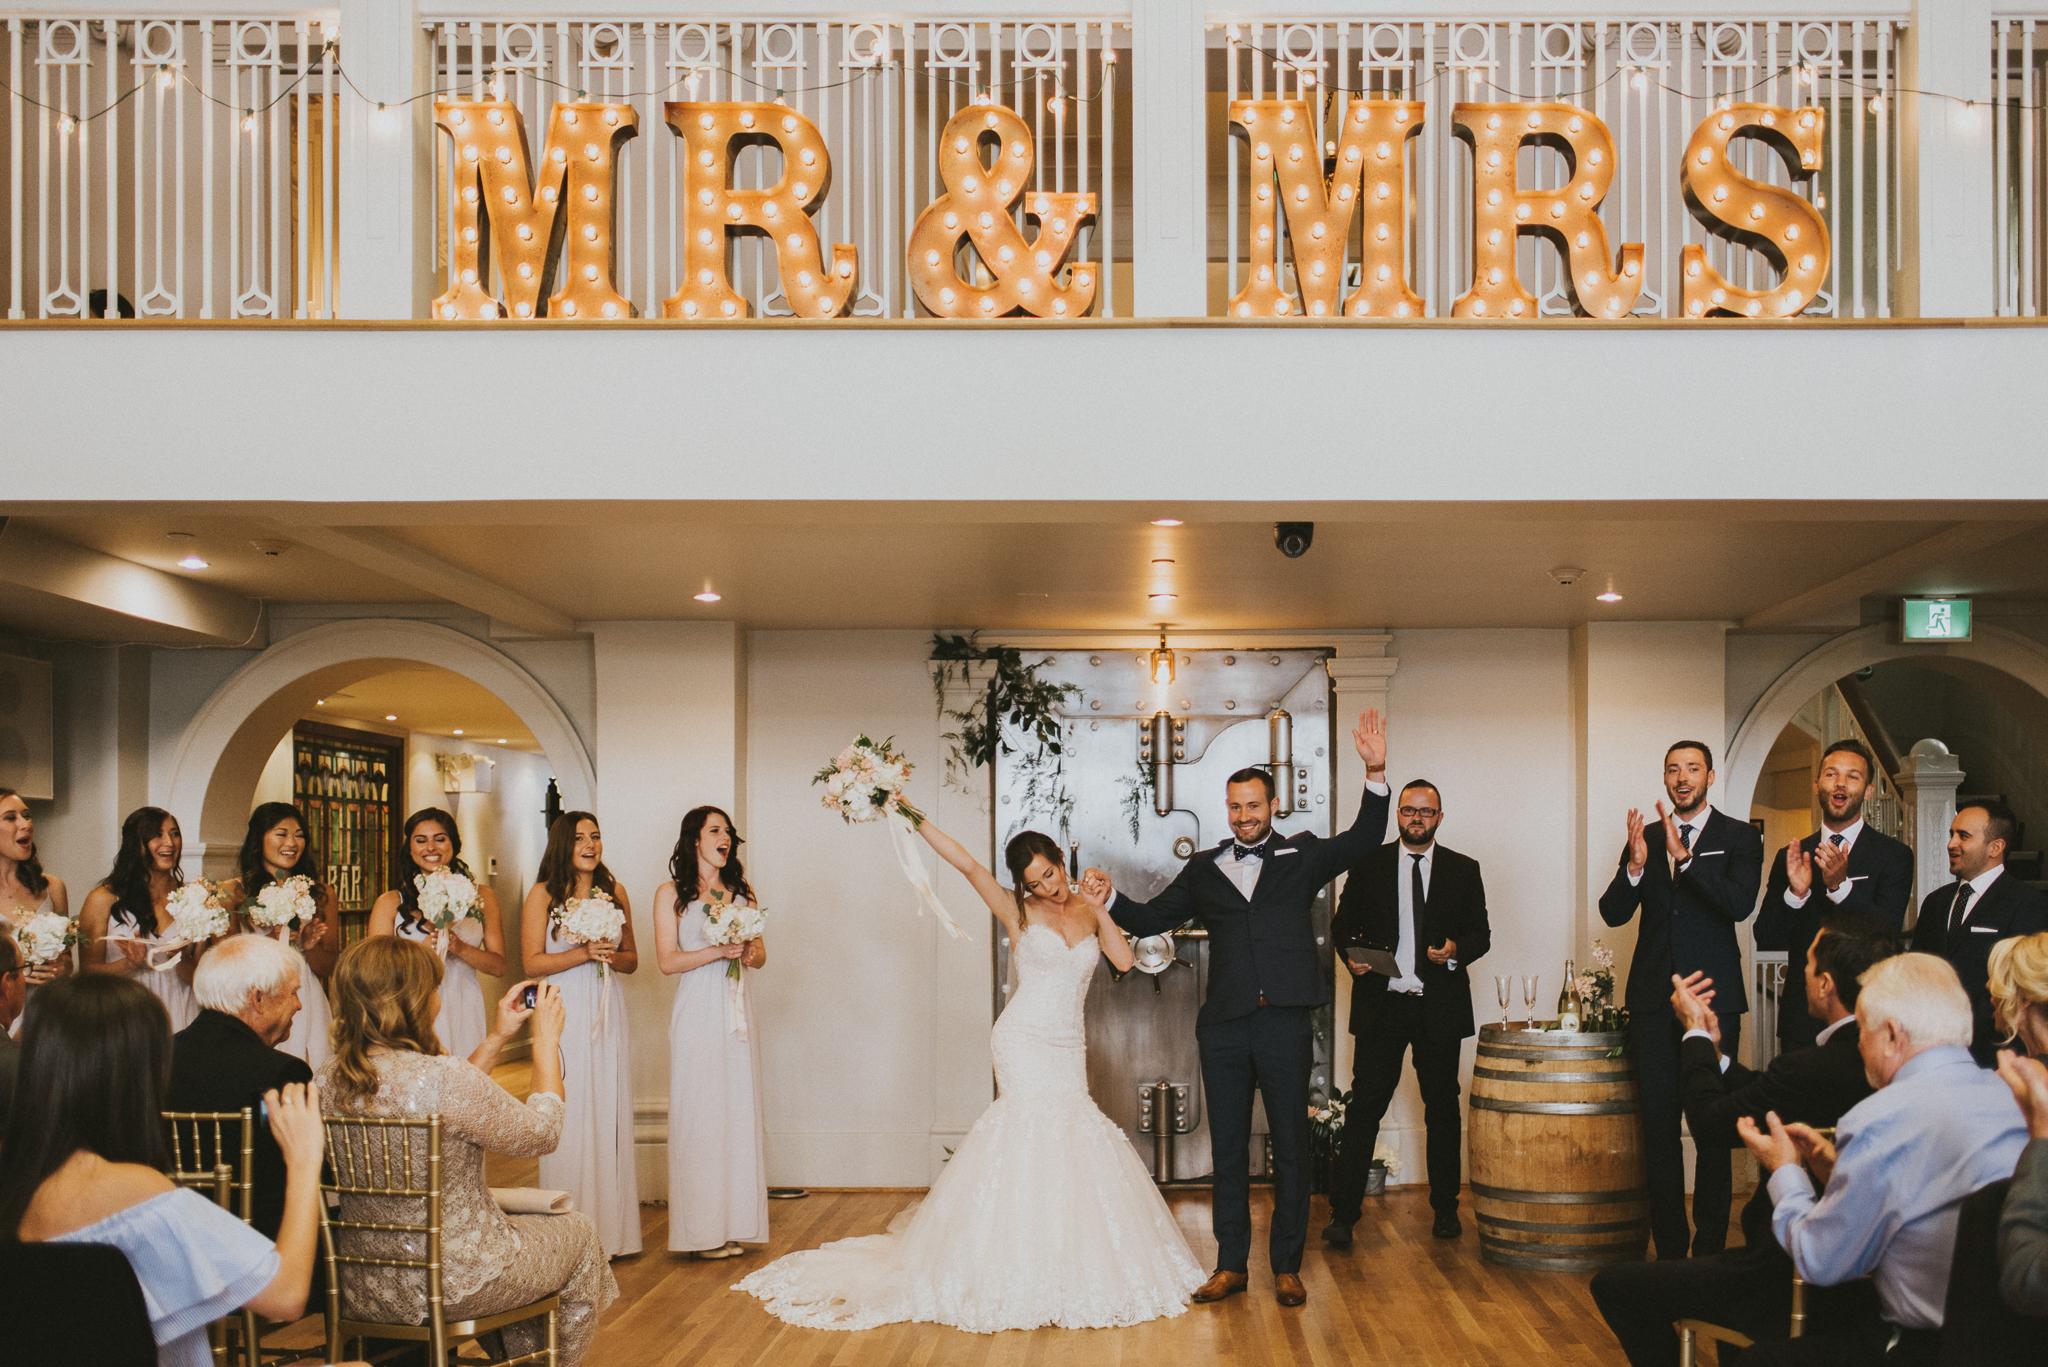 222-permanent-vancouver-wedding-courtneysteven-web-7960.jpg